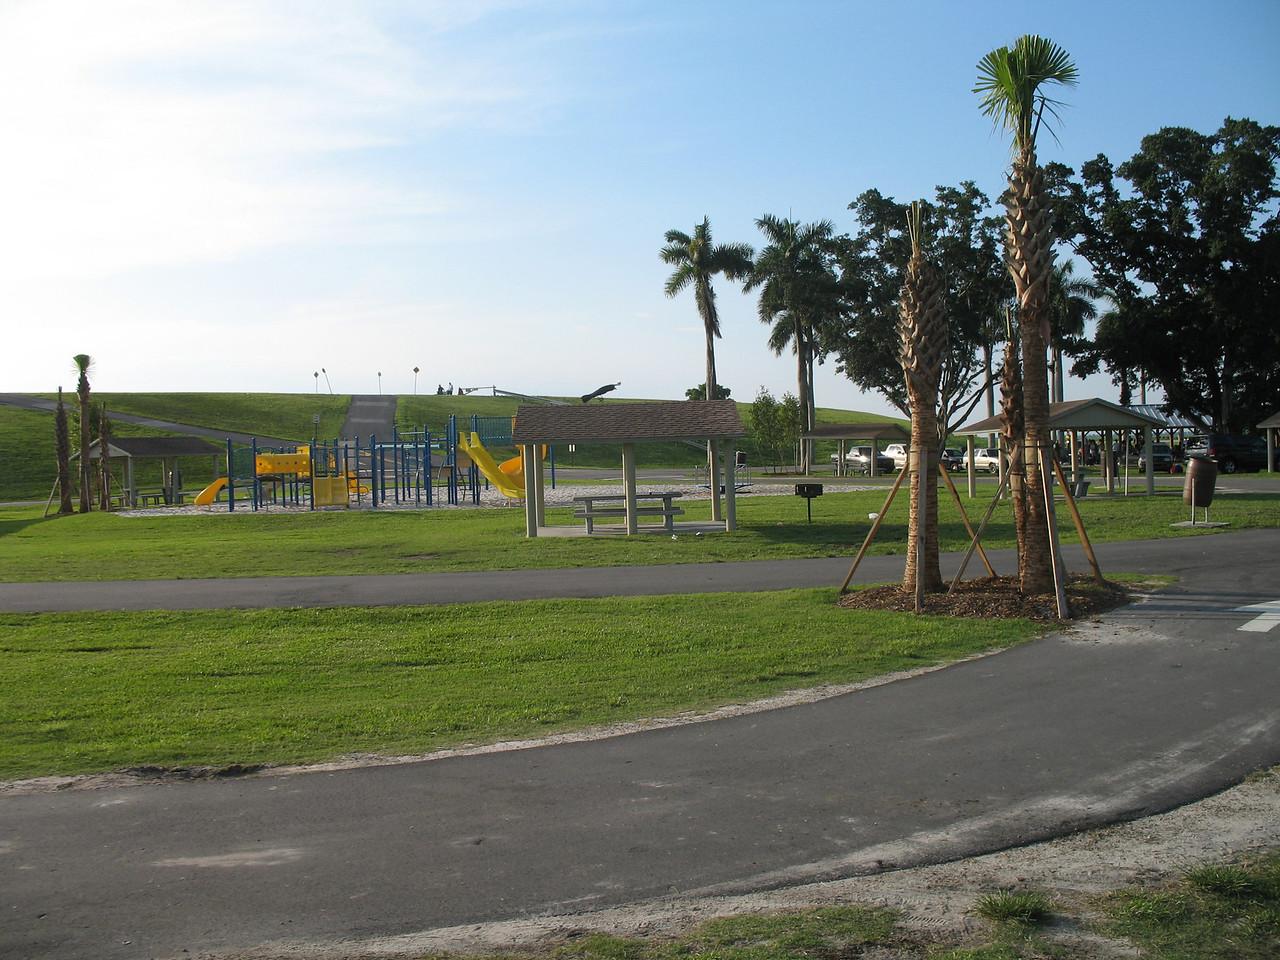 Rardin Park, between Pahokee and Belle Glade (Sandra Friend)